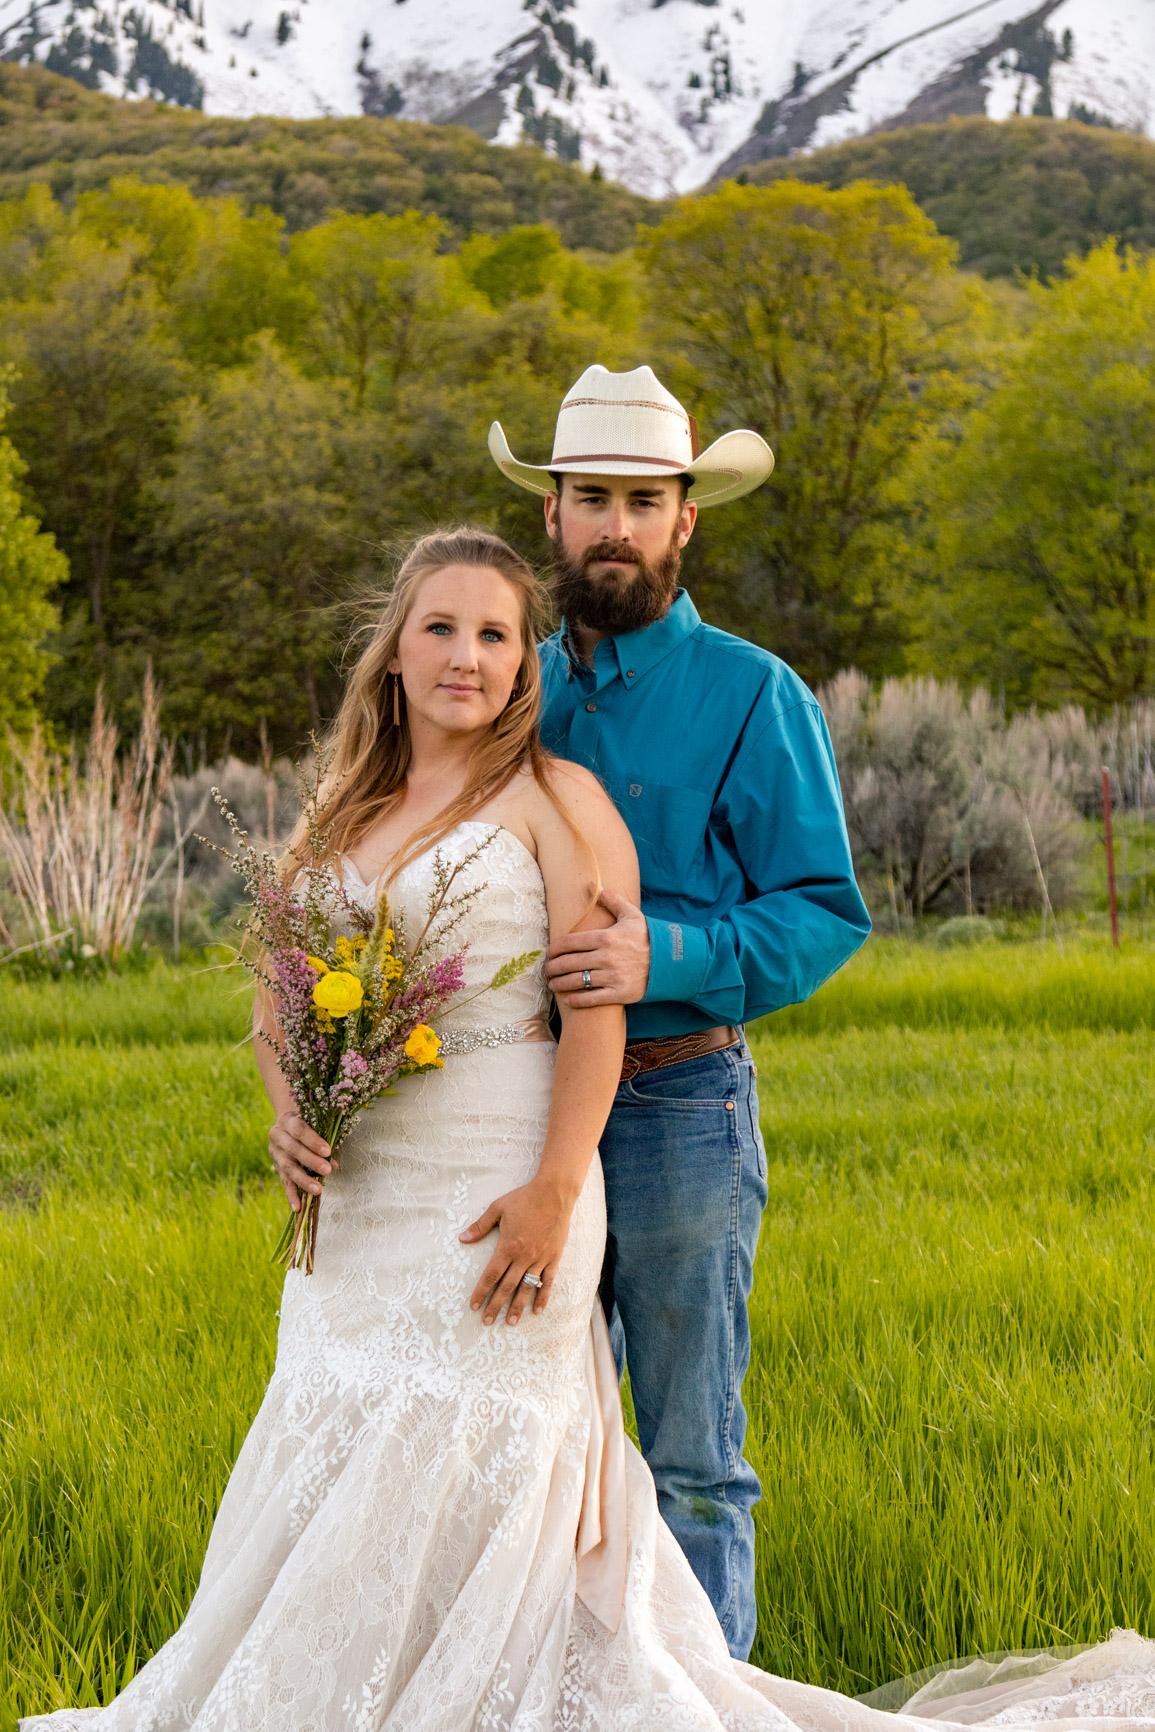 Rustic Wild Wedding Bouquet Elopement Rocky Mountains Wasatch Mountains Utah Halie West Photography 7